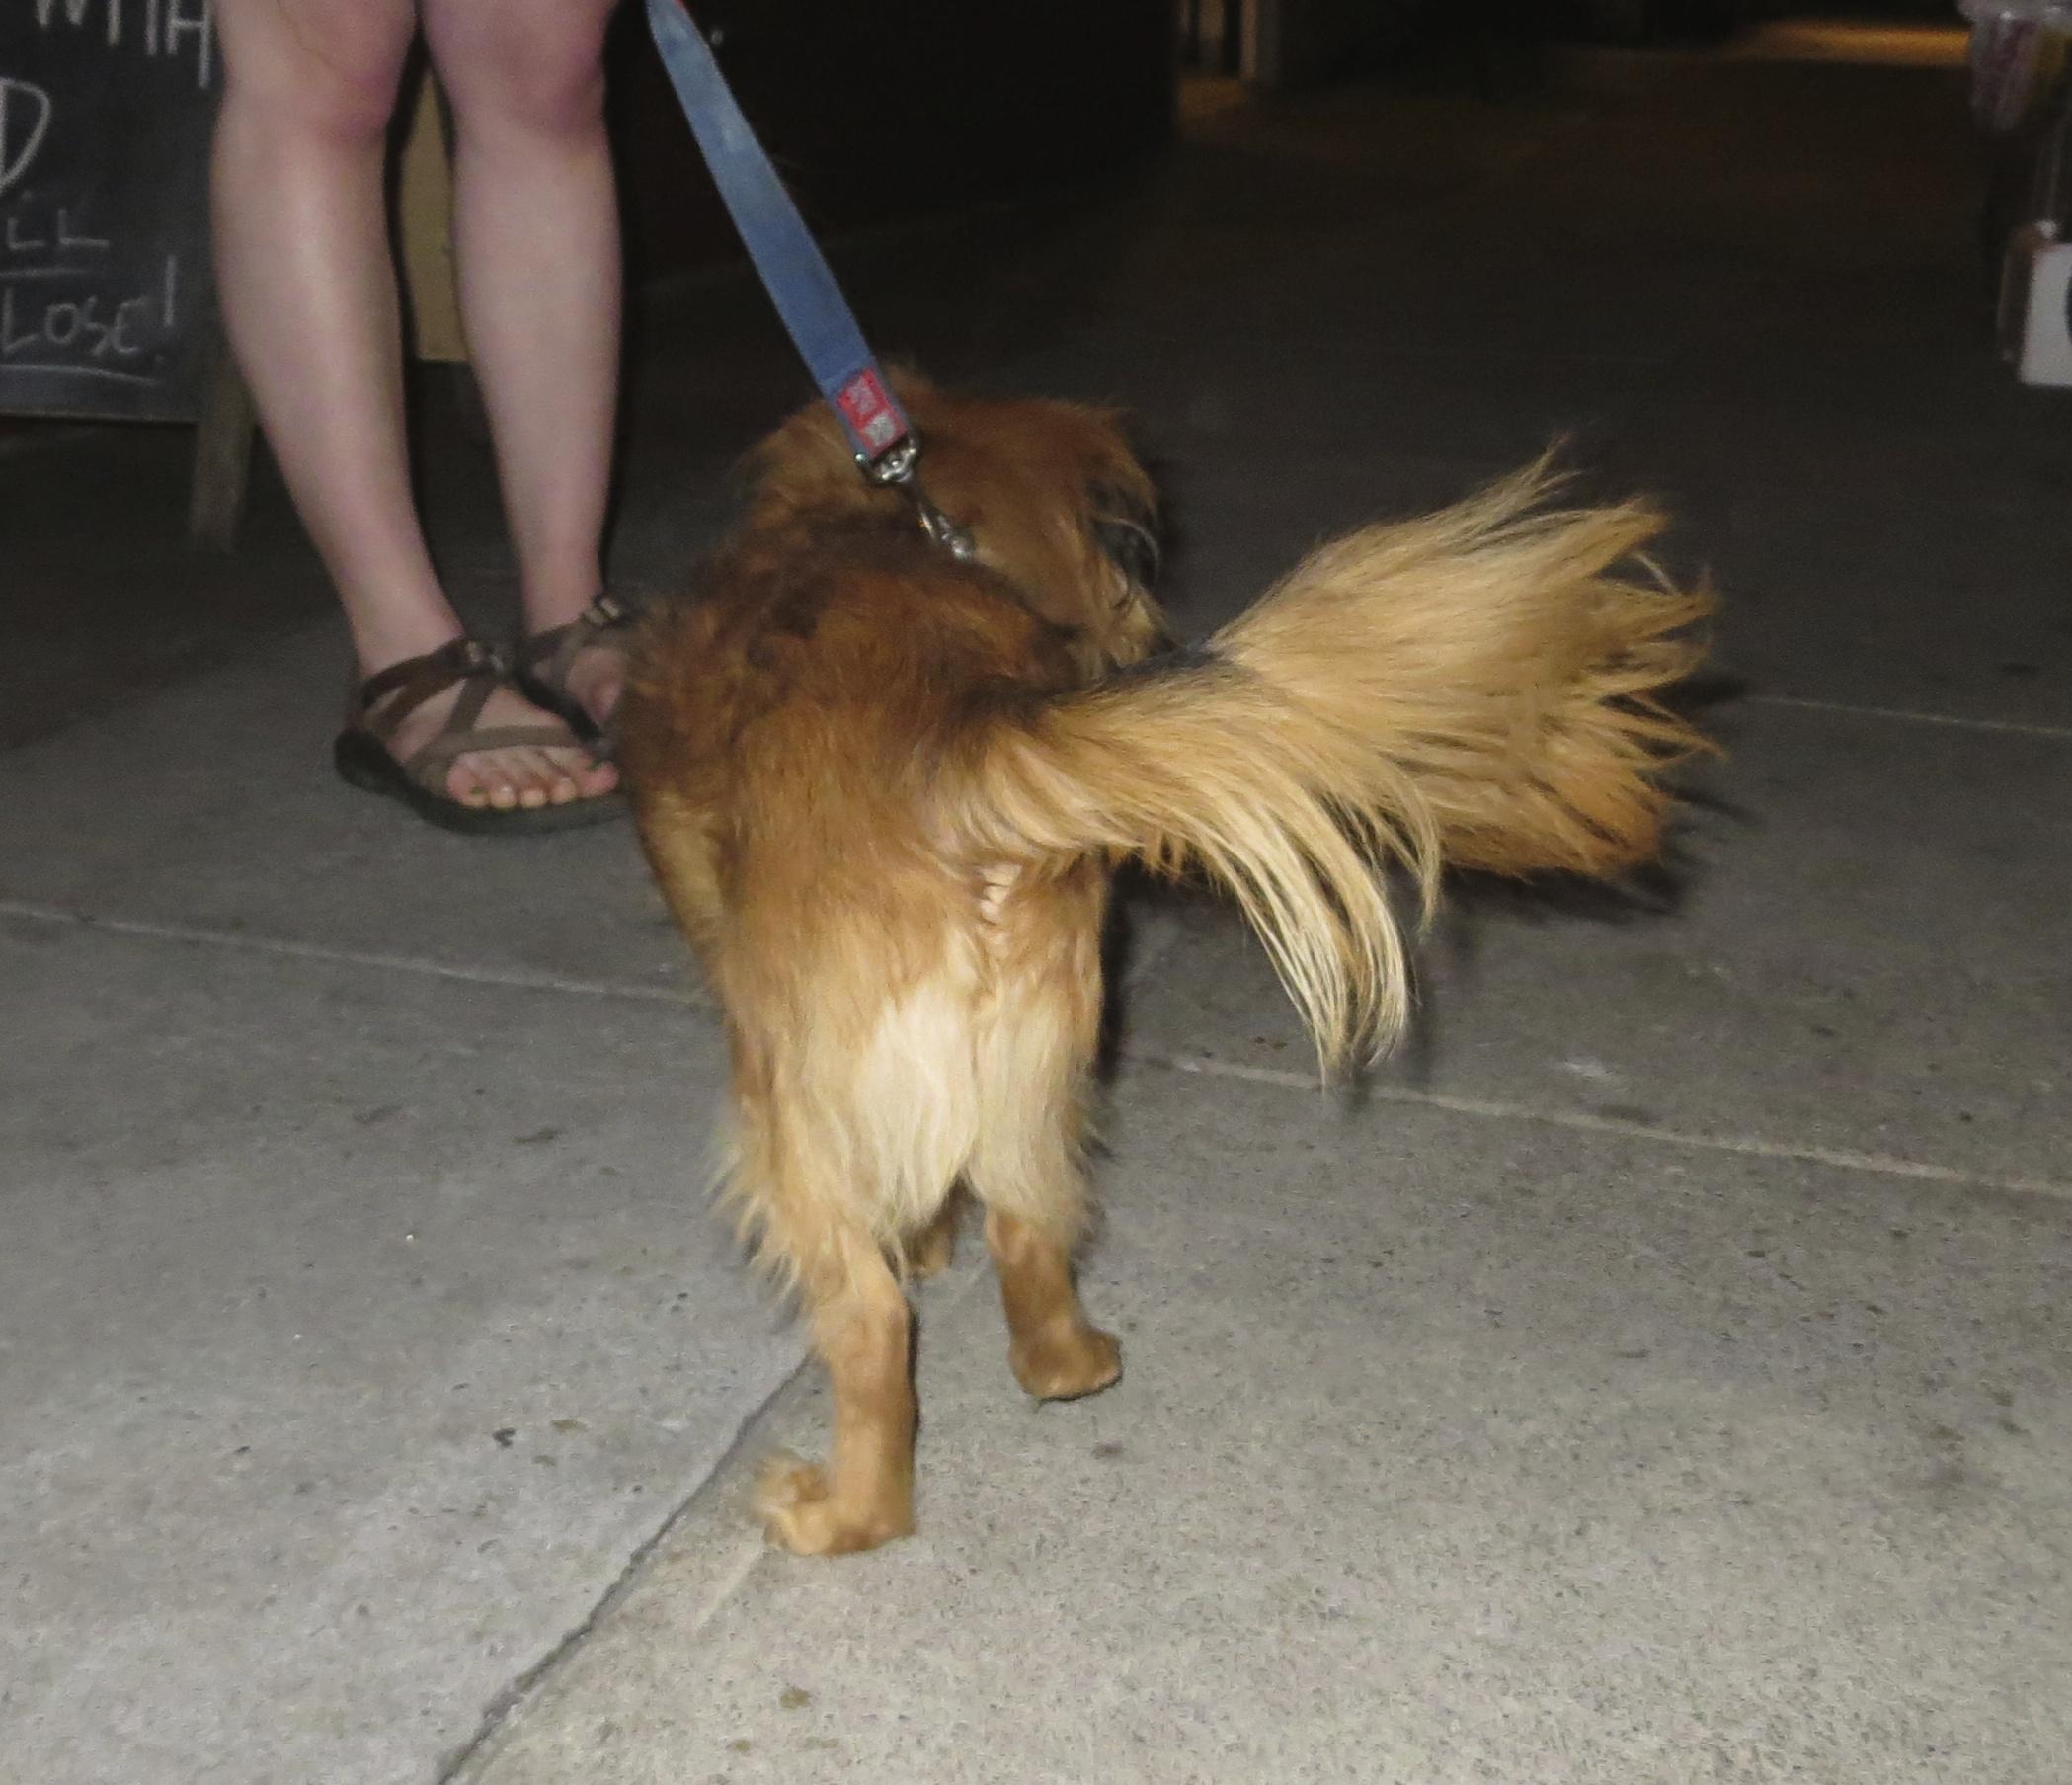 Fluffy Small Dog Backside